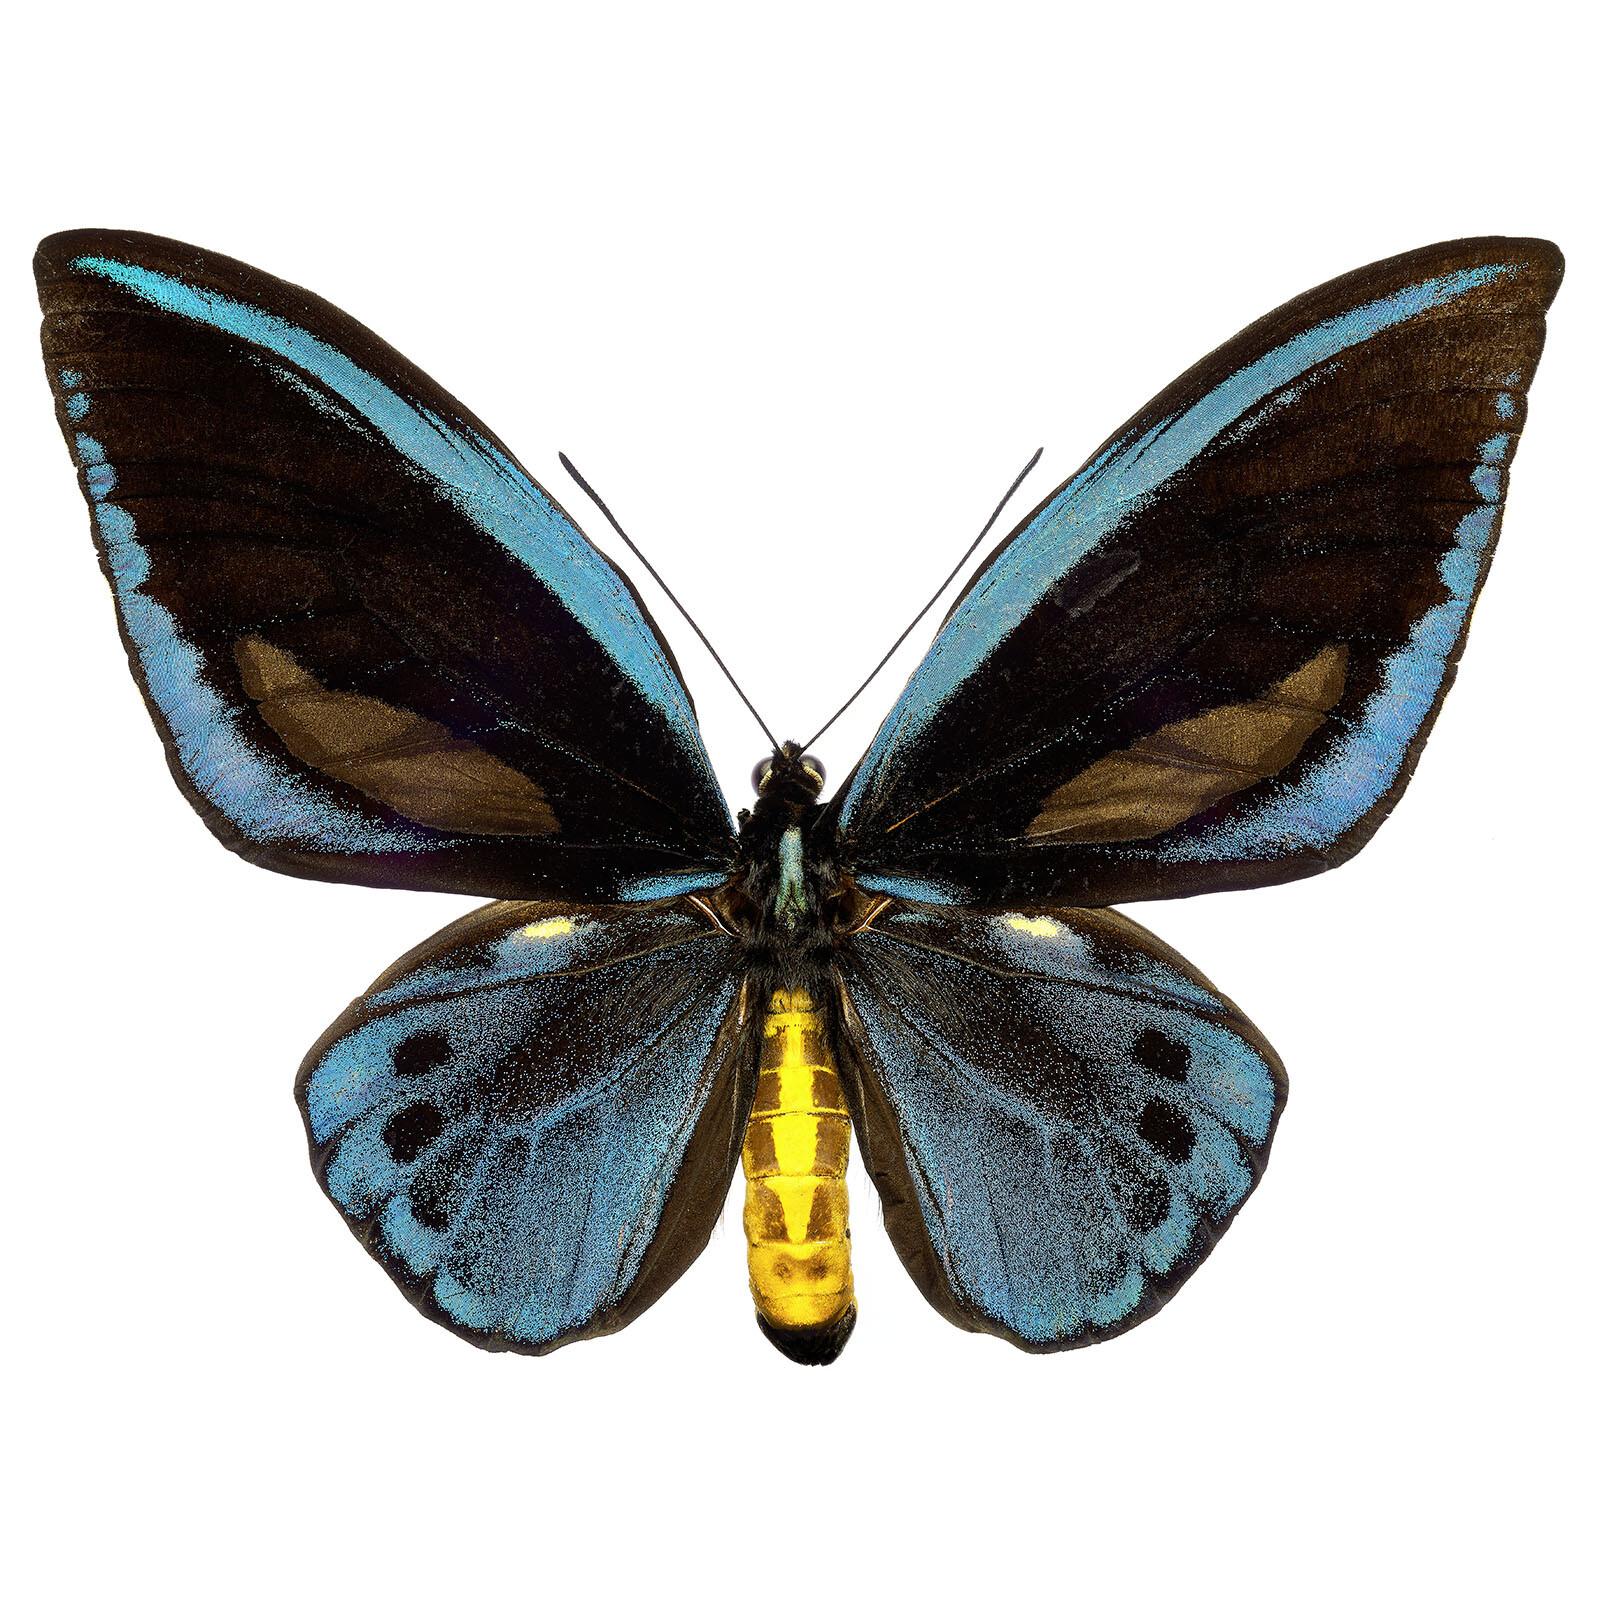 Butterfly IX - Heiko Hellwig